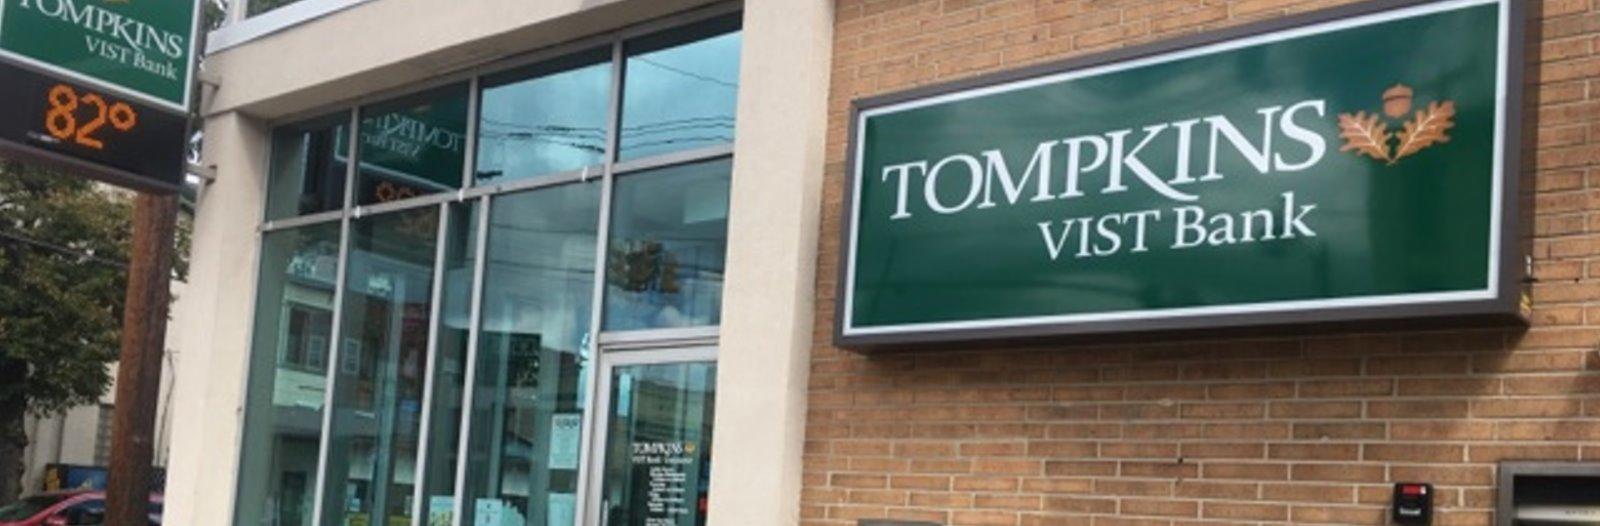 Tompkins Vist Bank looking to increase business development